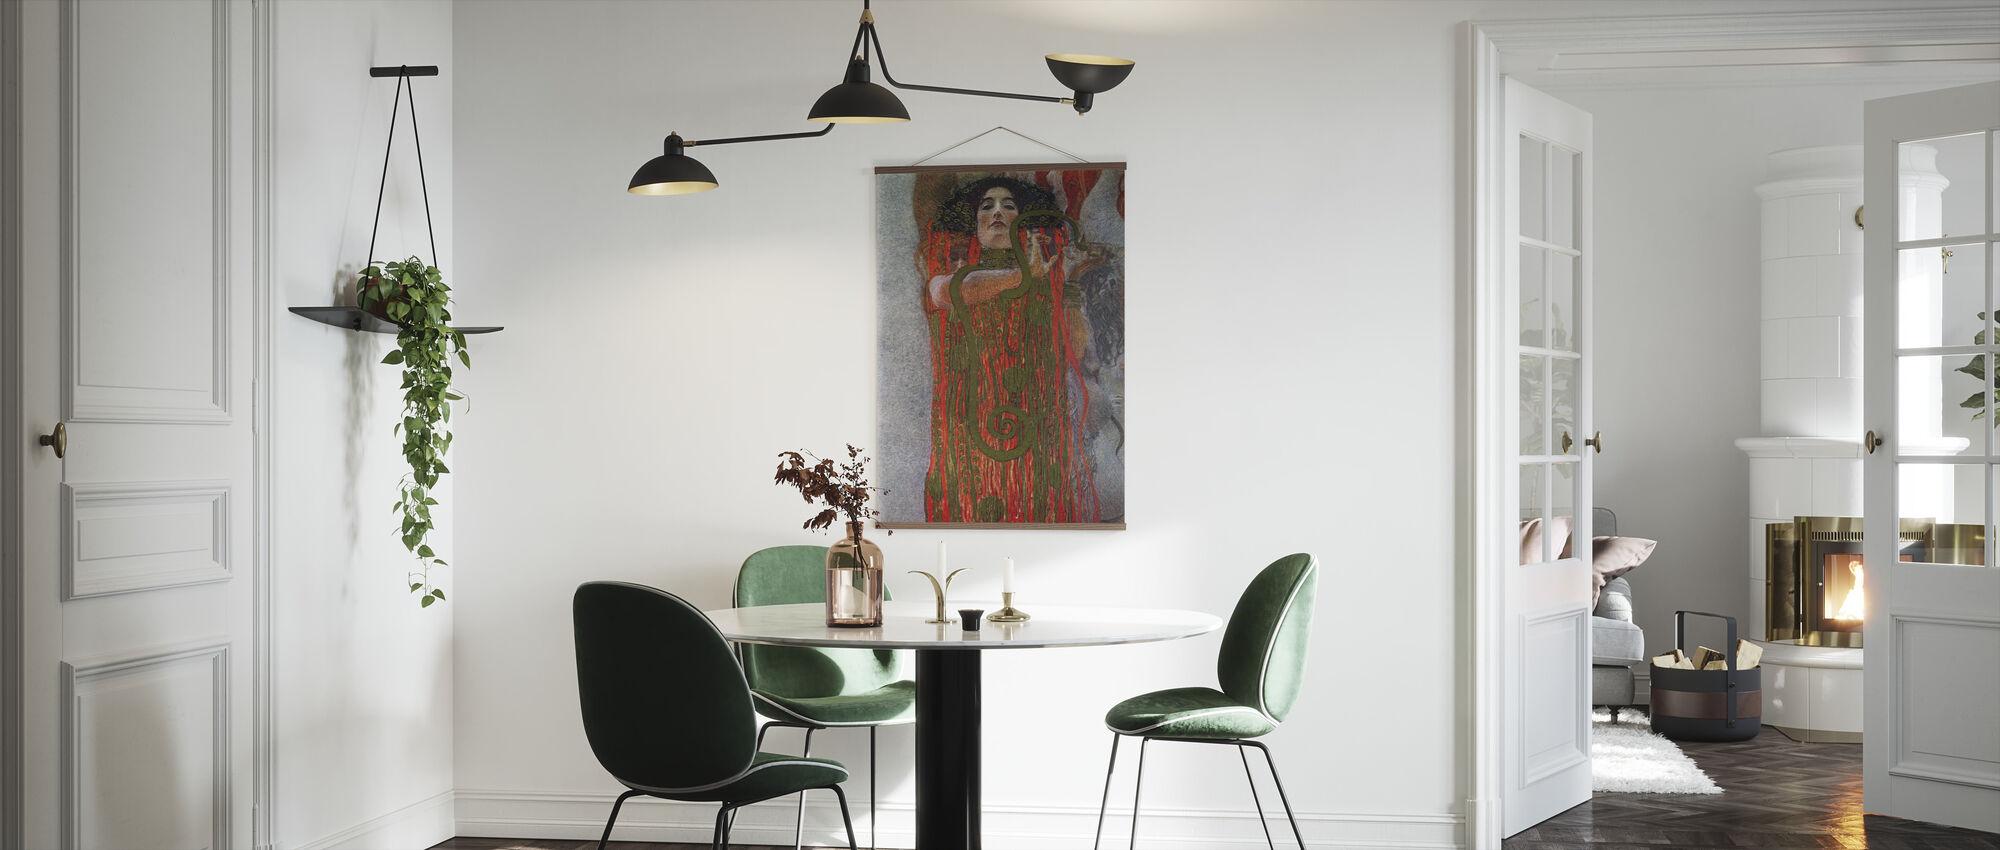 Hygieia - Gustav Klimt - Poster - Keuken